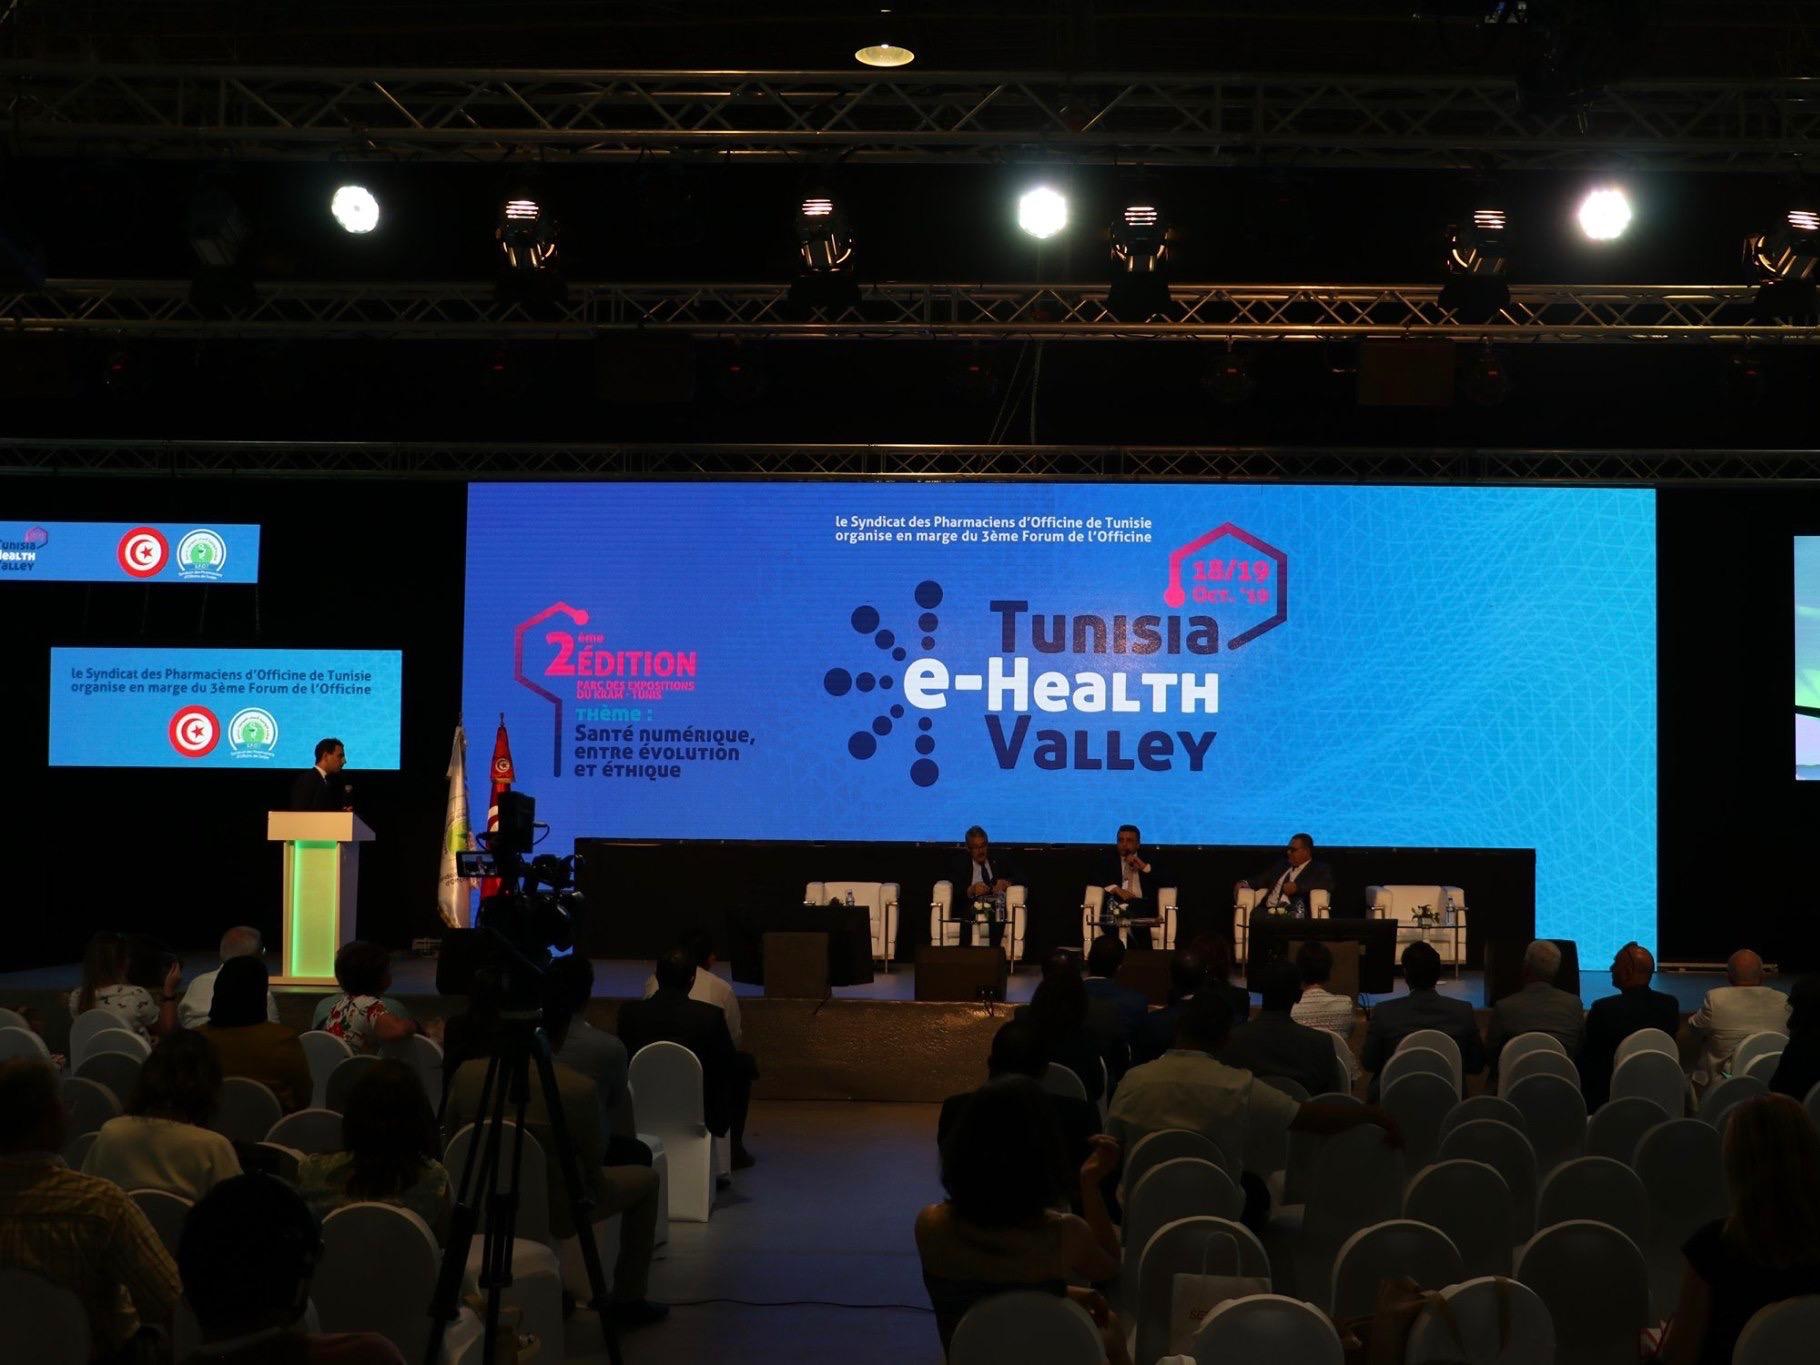 Tunisia e-Health Valley 2019 Dr Ahmed SKHIRI - 2